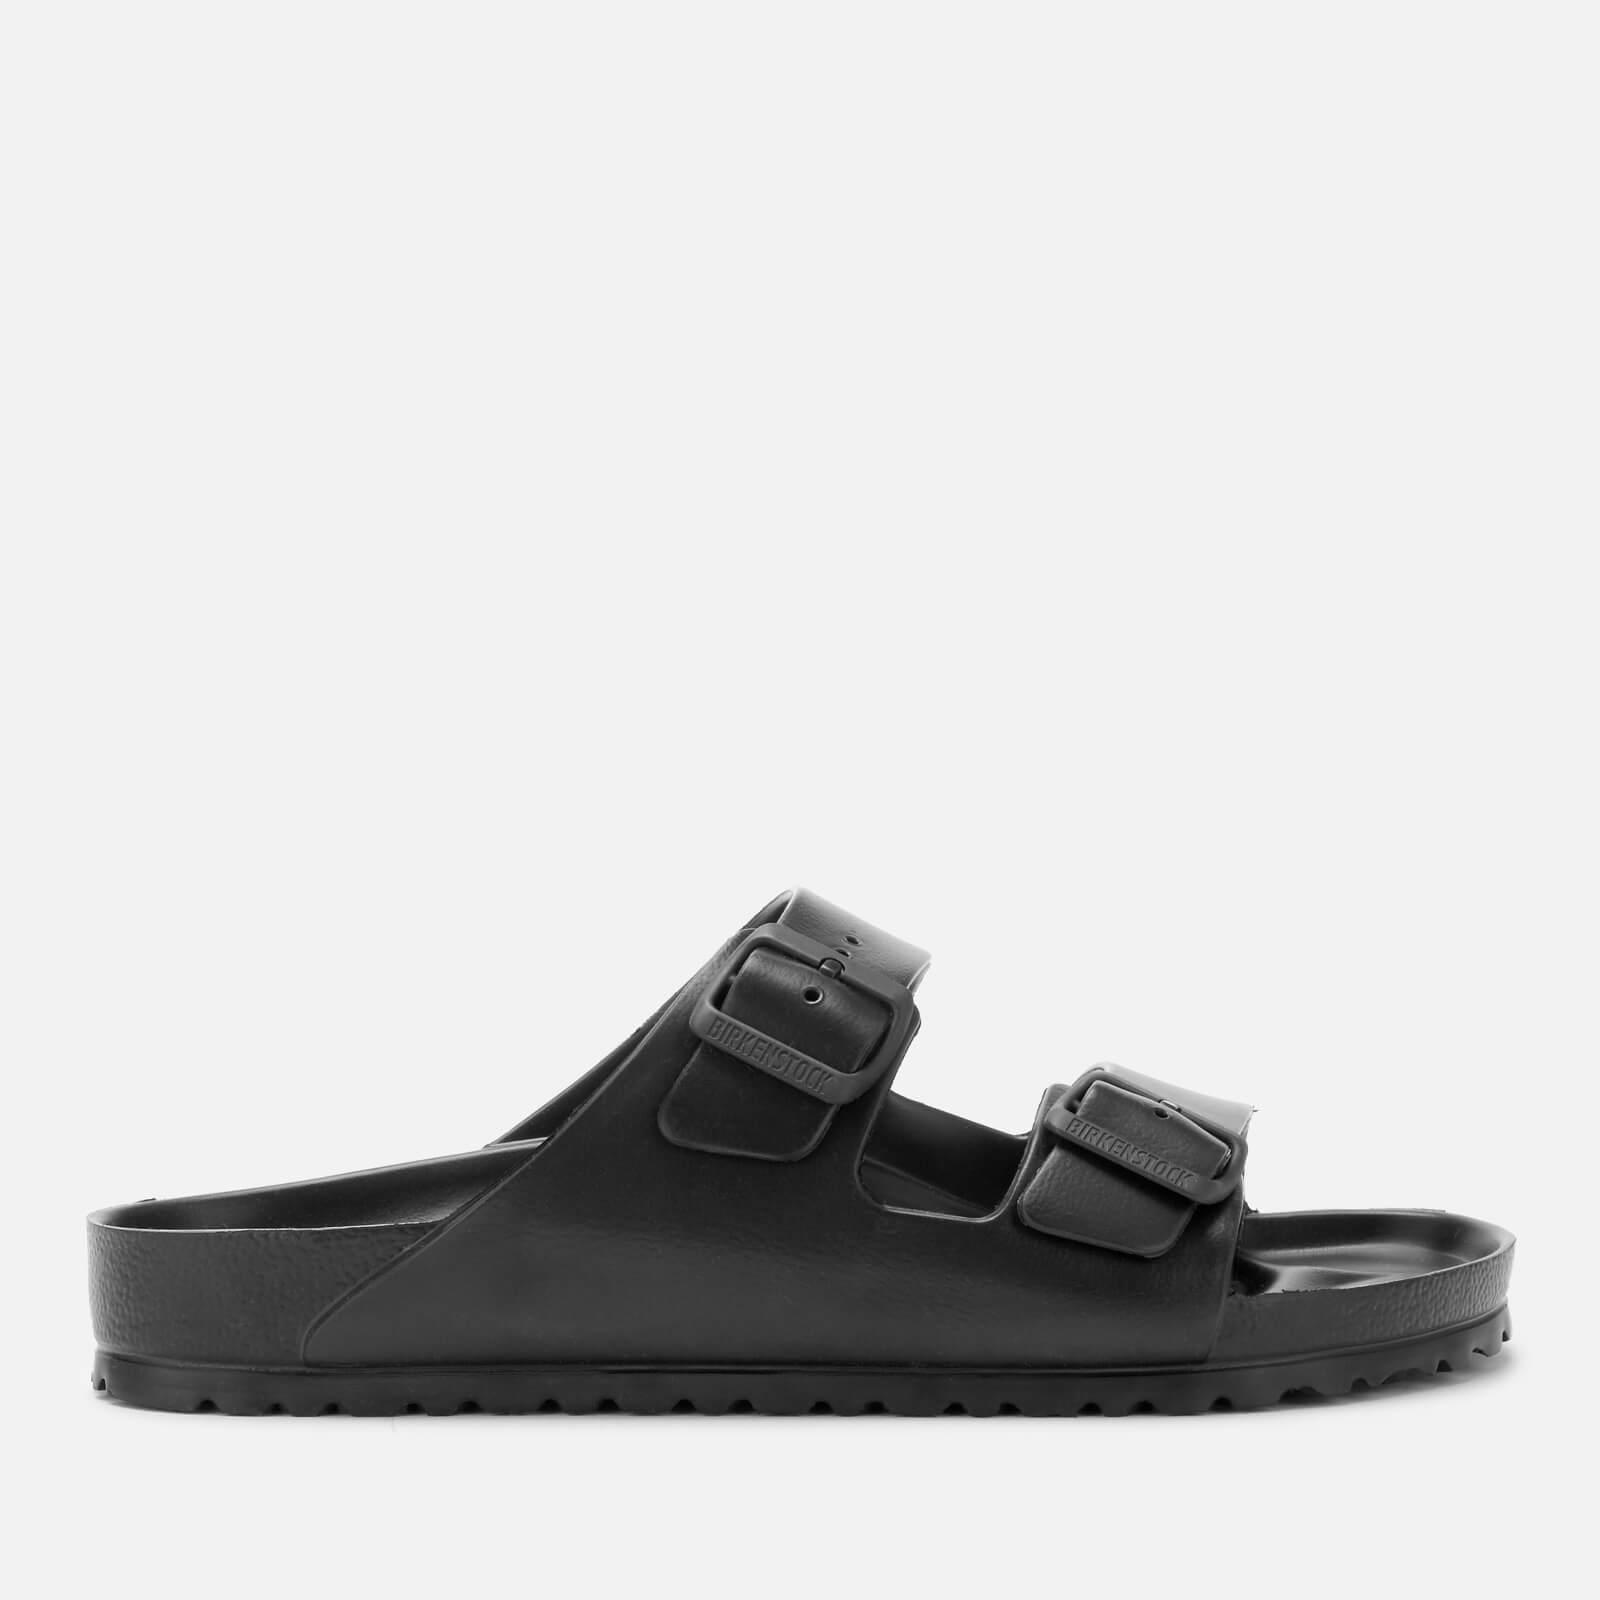 f5e2afd6da74 Birkenstock Men s Arizona EVA Double Strap Sandals - Black Mens Footwear